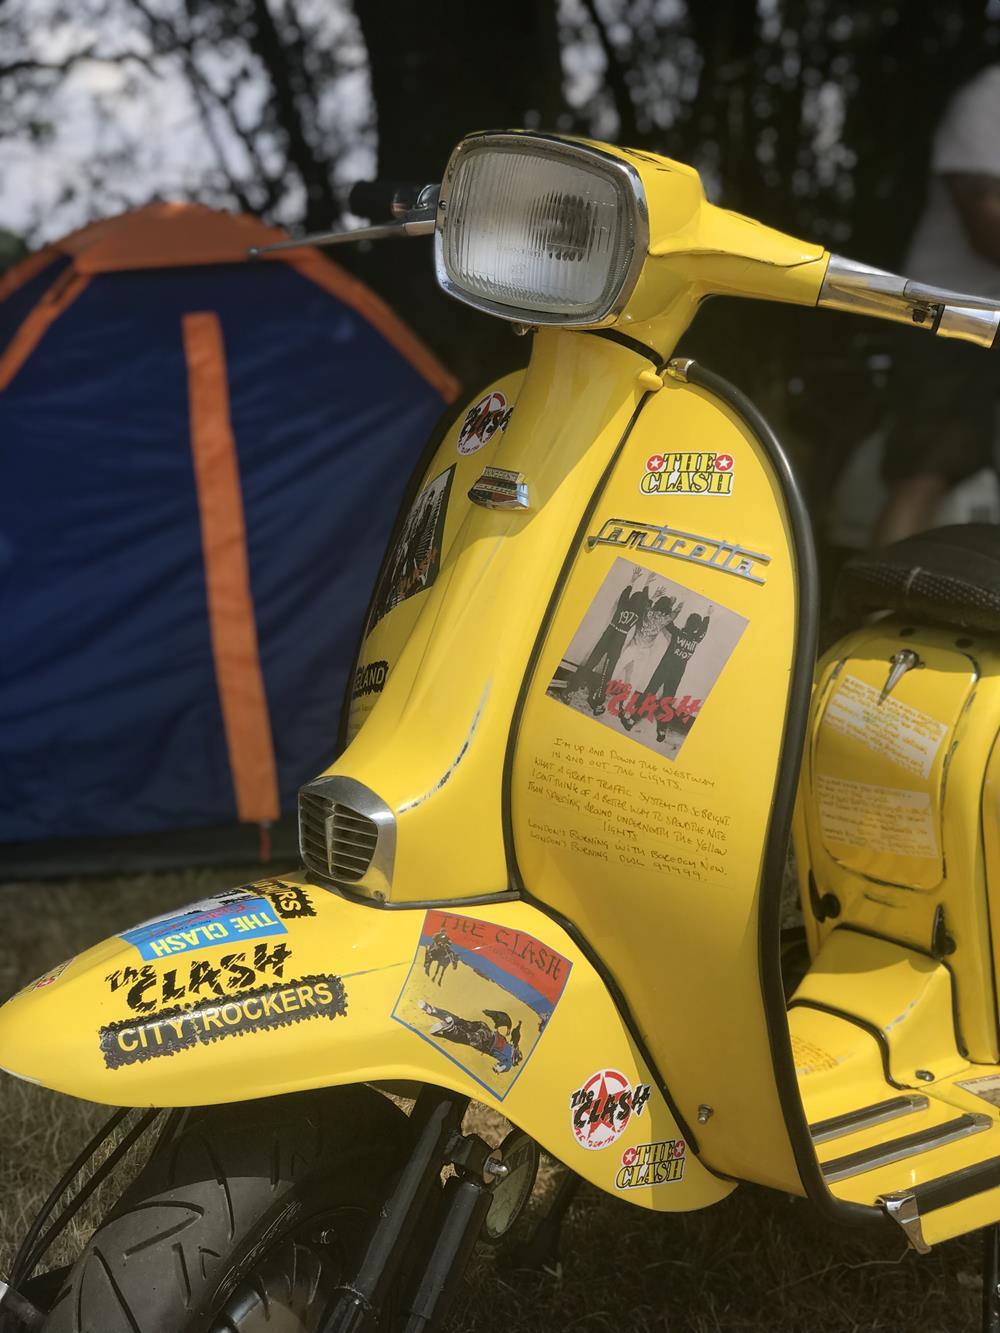 Yellow Lambretta with Clash theme